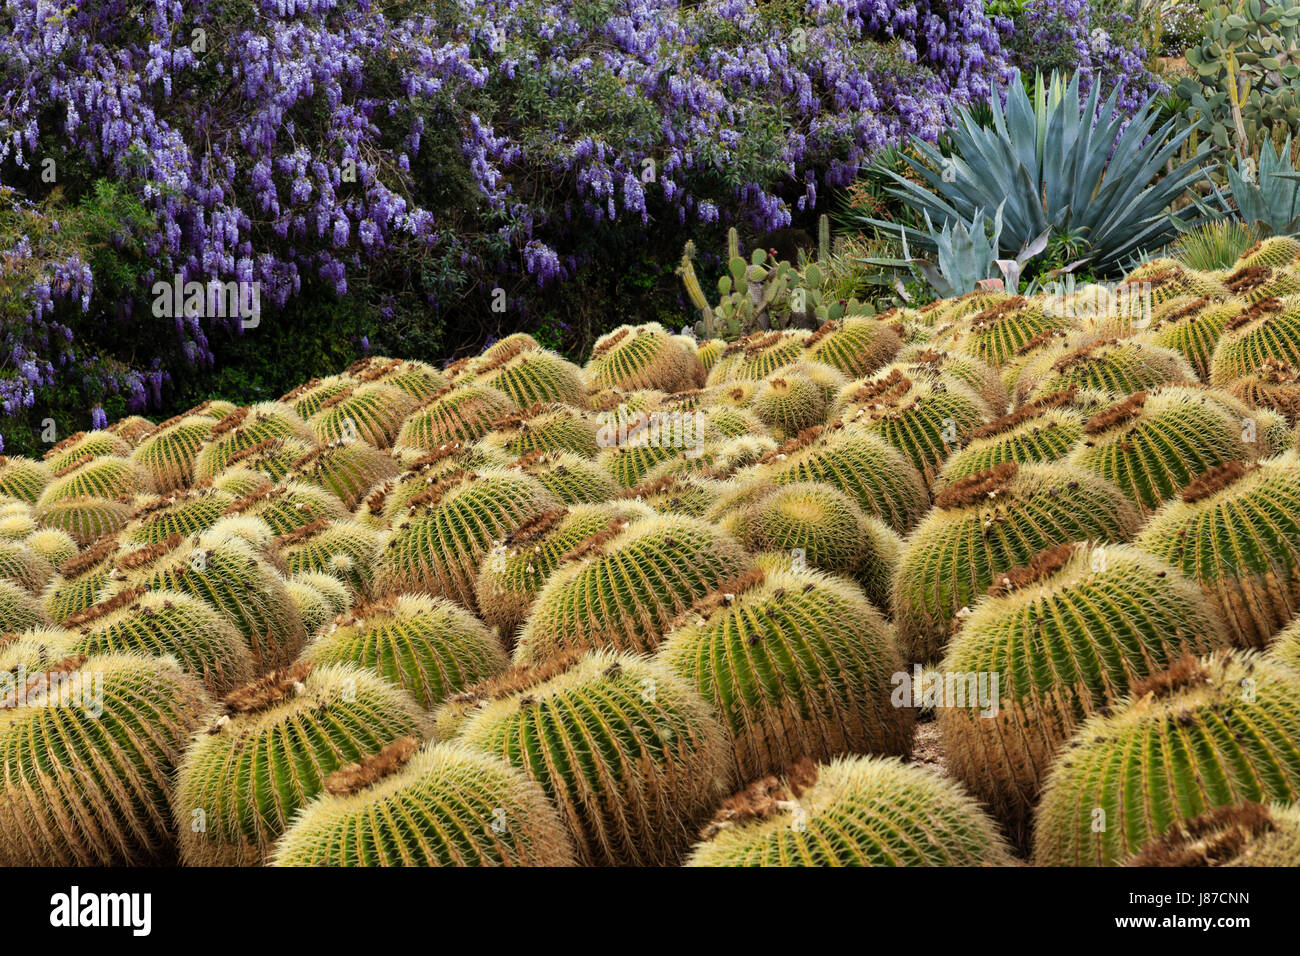 Costa brava jardins botaniques marimurtra botanical gardens - Spain Catalonia Costa Brava Blanes Pinya De Rosa Tropical Botanical Garden With